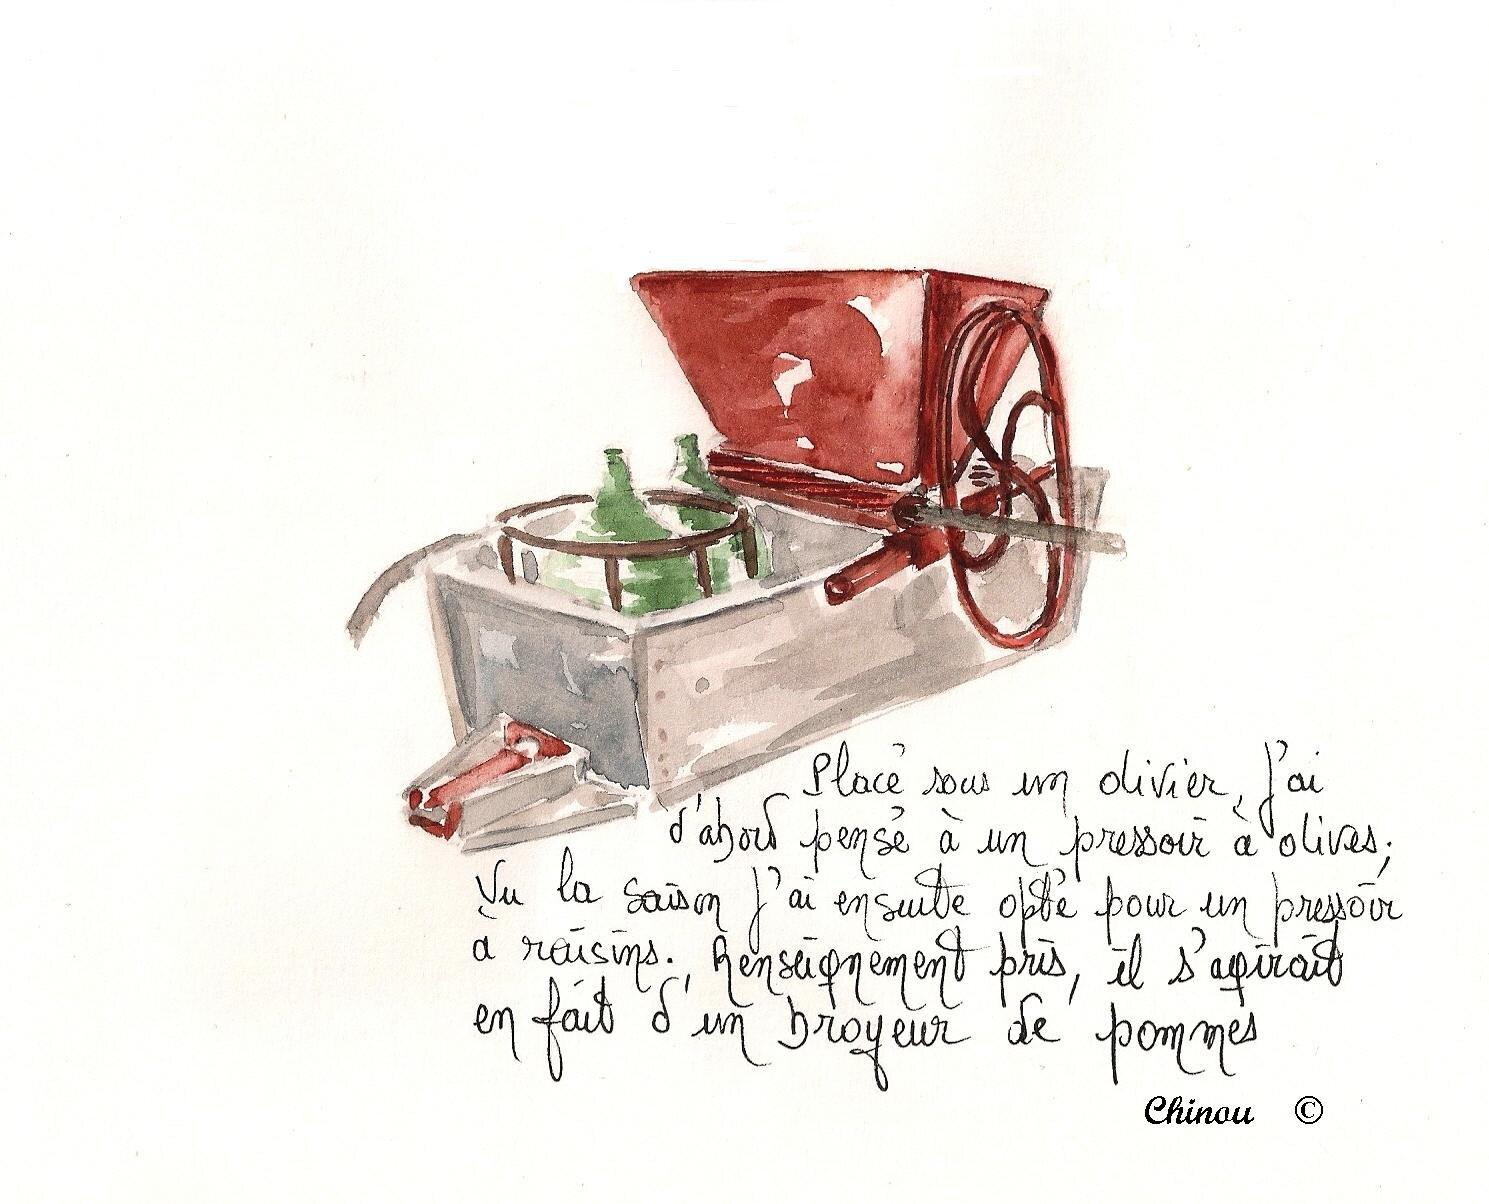 67_Broyeur_de_pommes